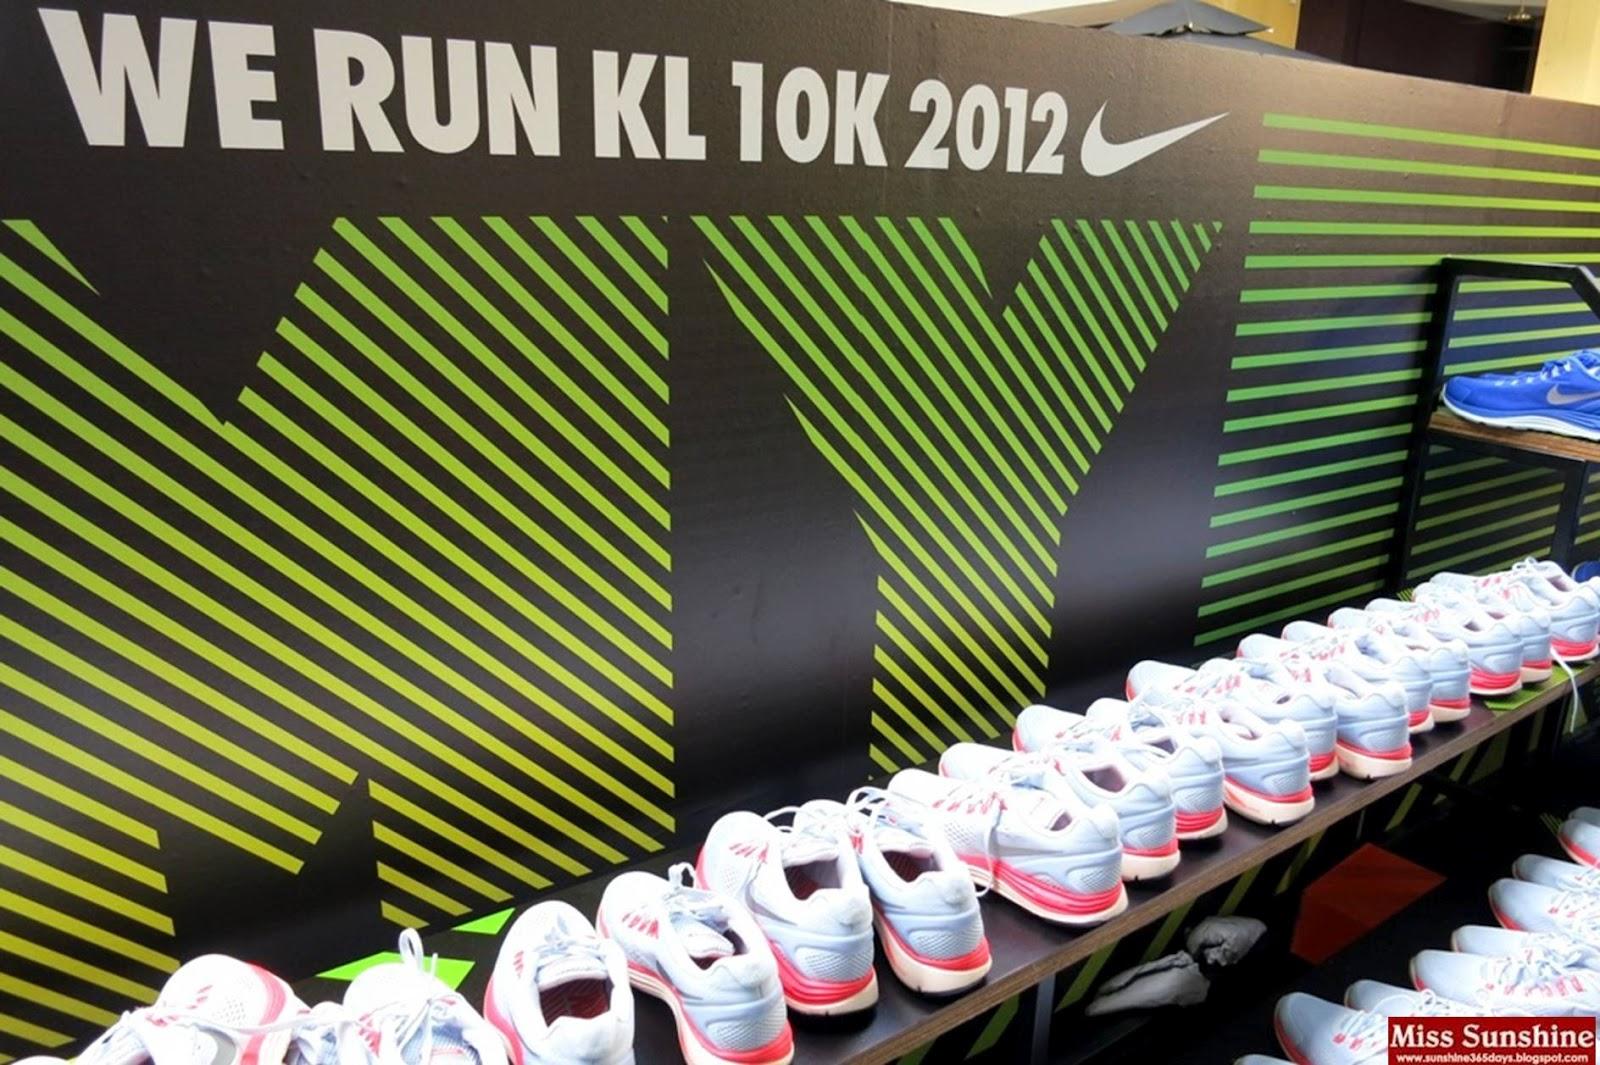 d7af24abcea Nike We Run 10K KL 2012 will flag off at 5.30pm at Jalan Ampang on 13th  October 2012